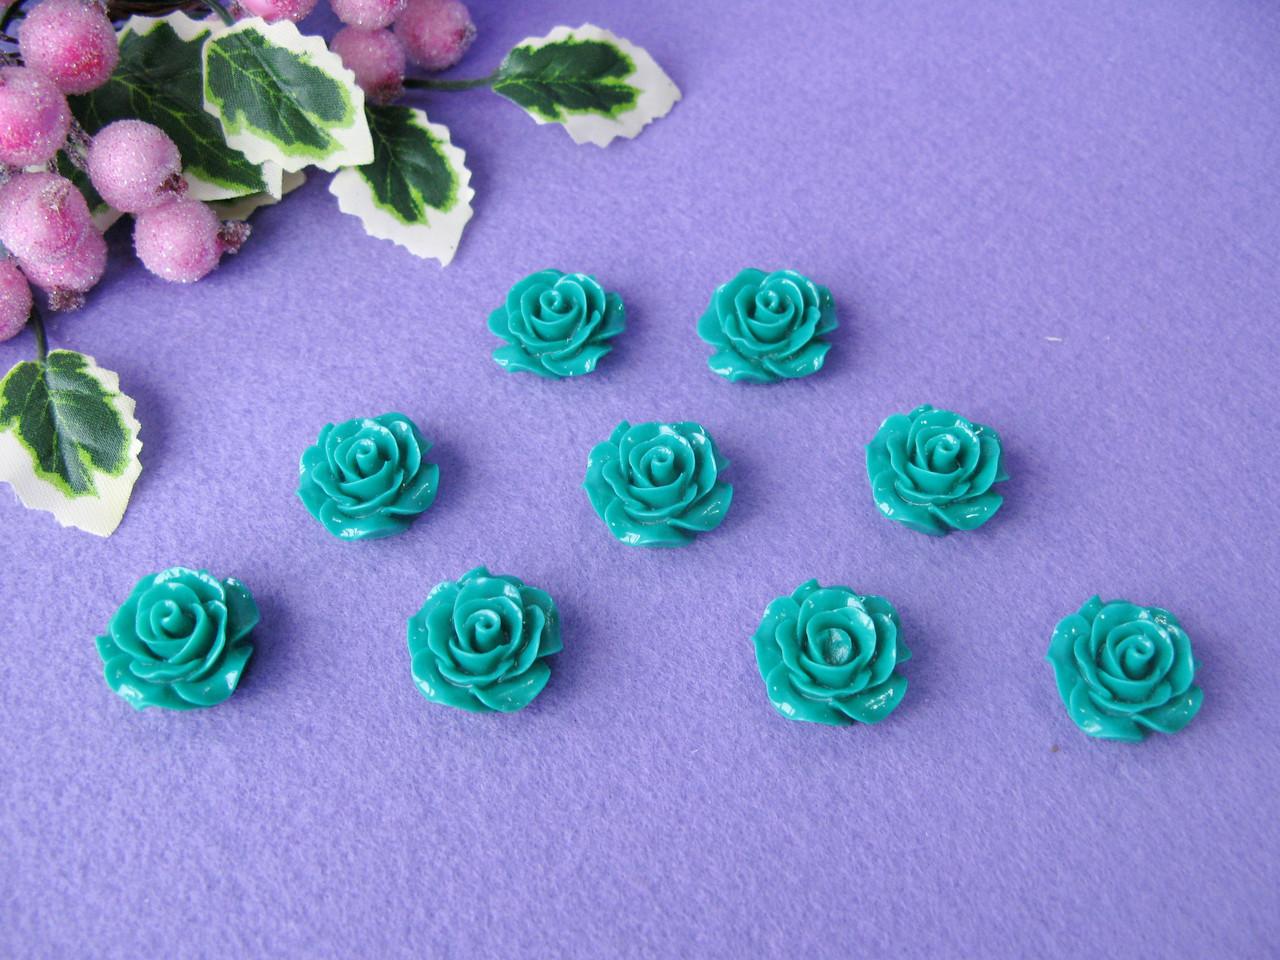 Серединка акриловая - Зеленая роза р-р - 2 см цена 20 грн - 10 шт